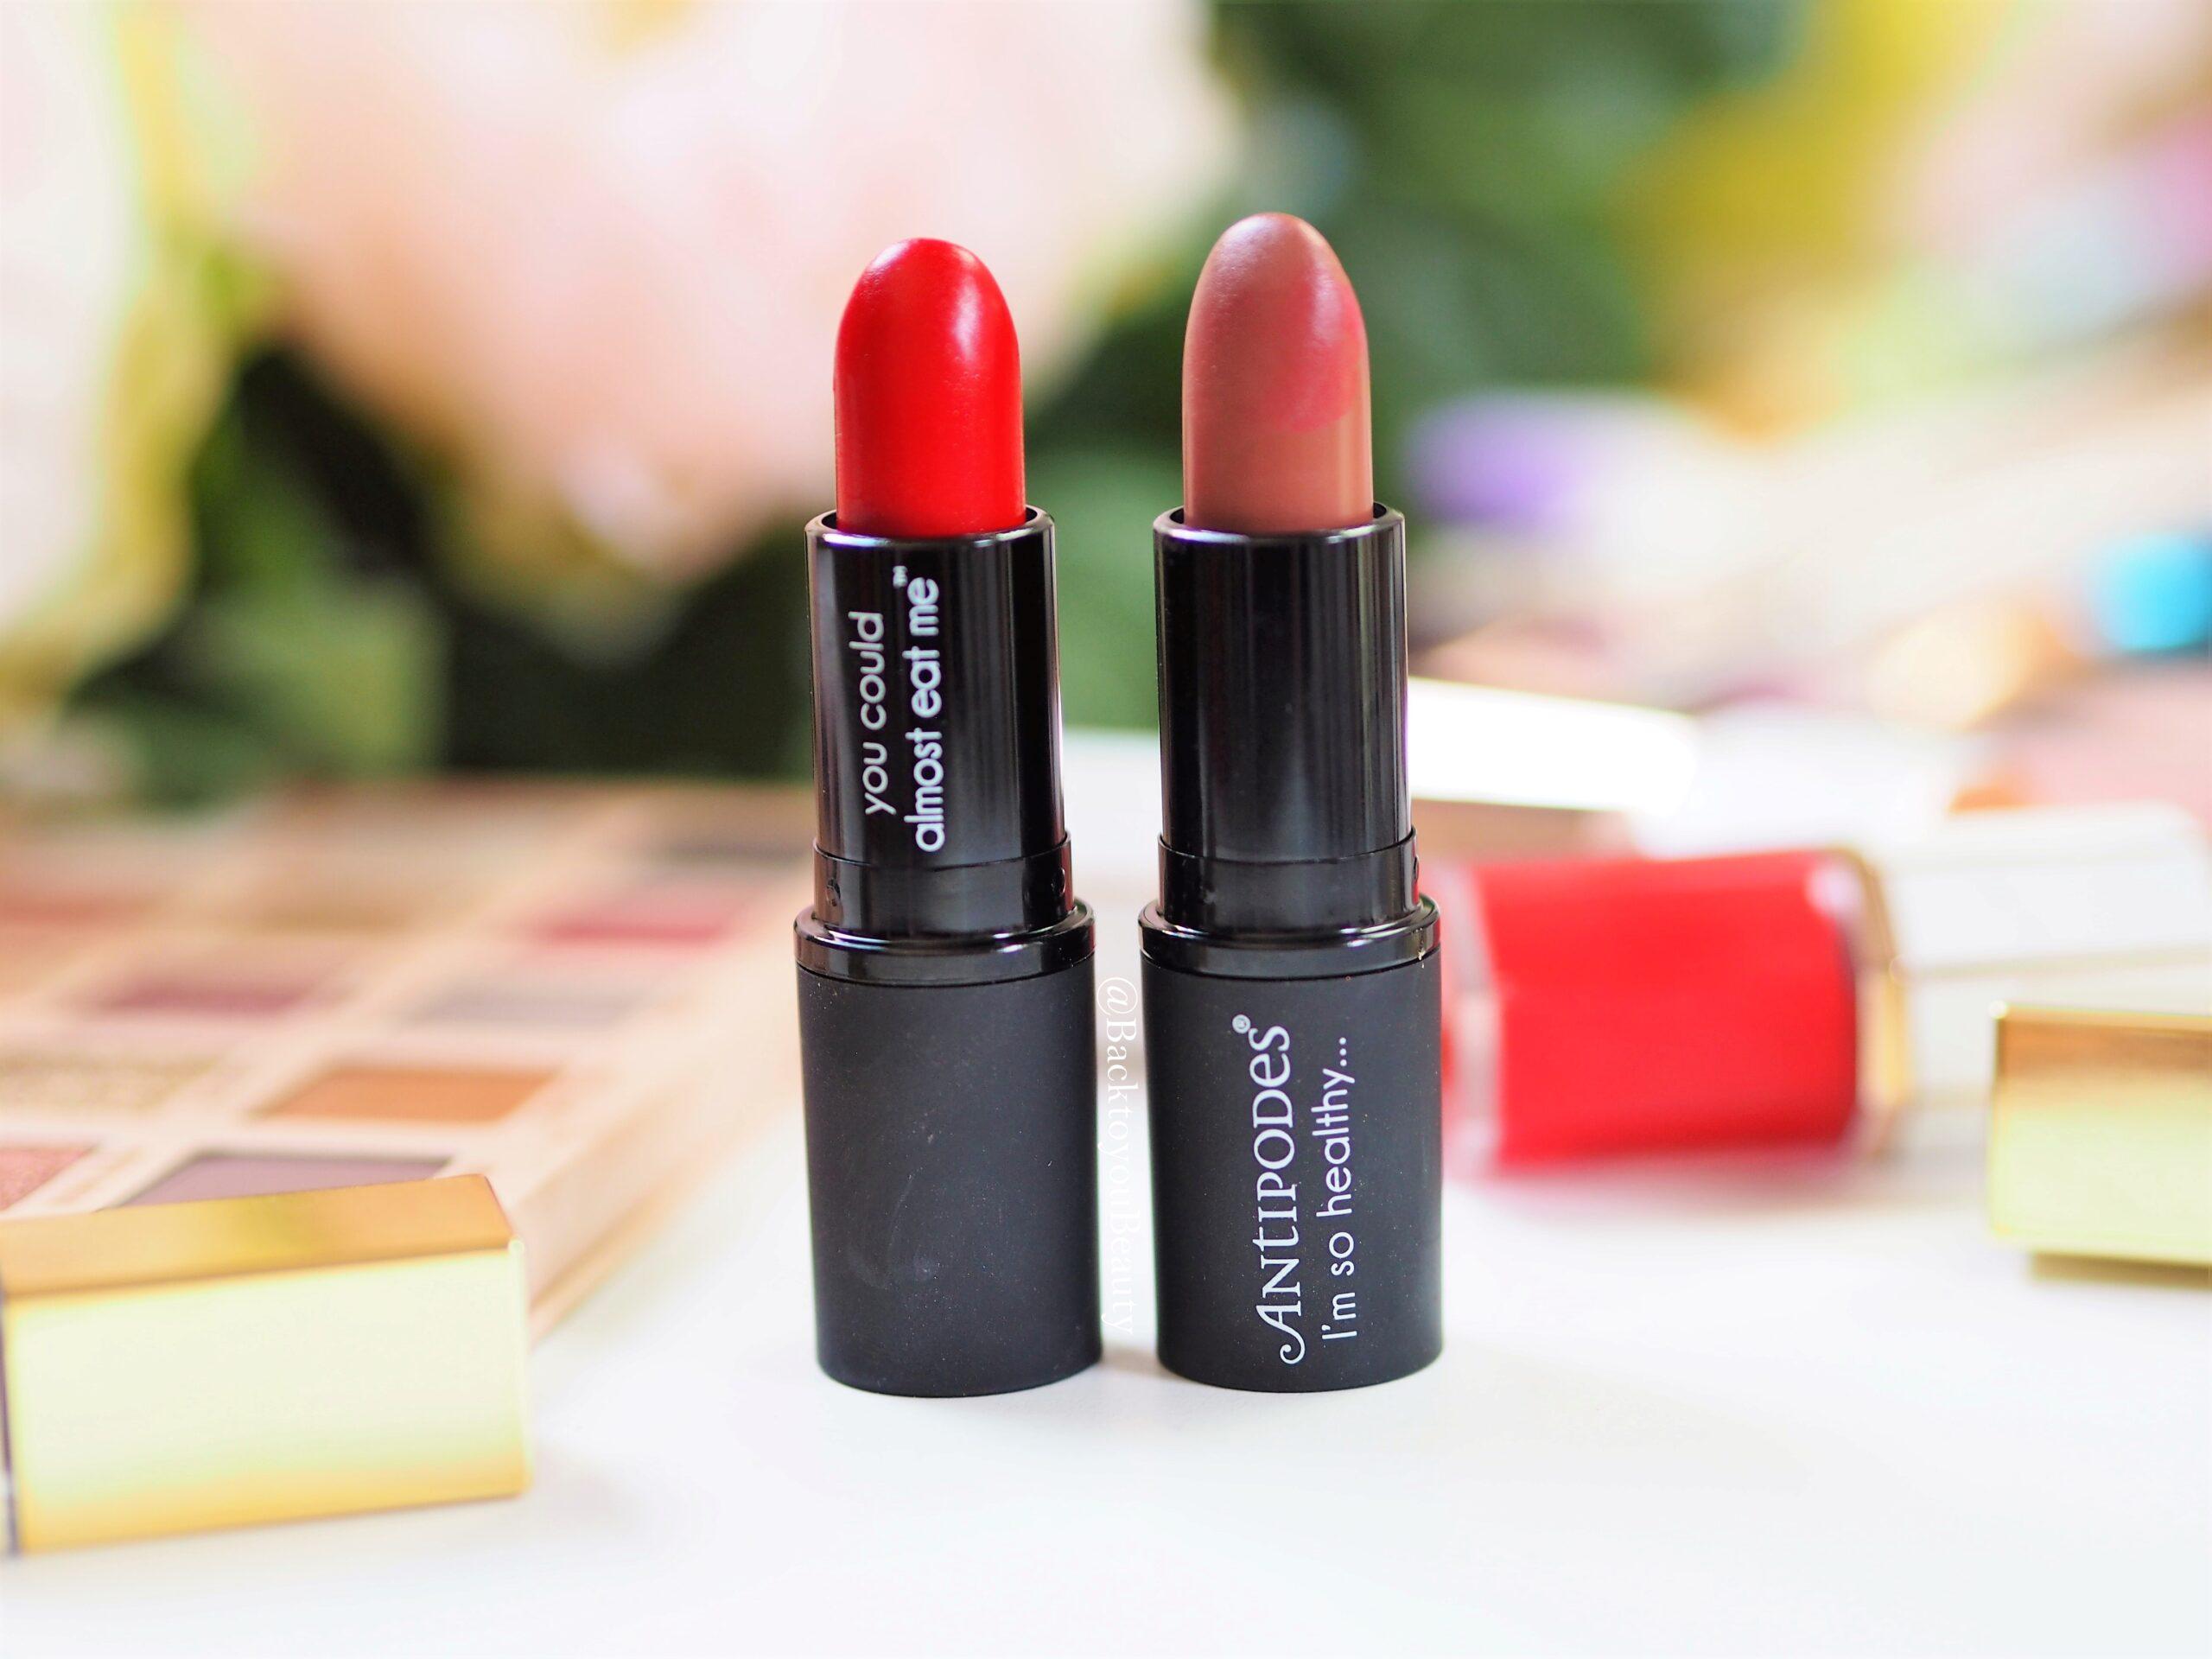 Antipodes lipstick